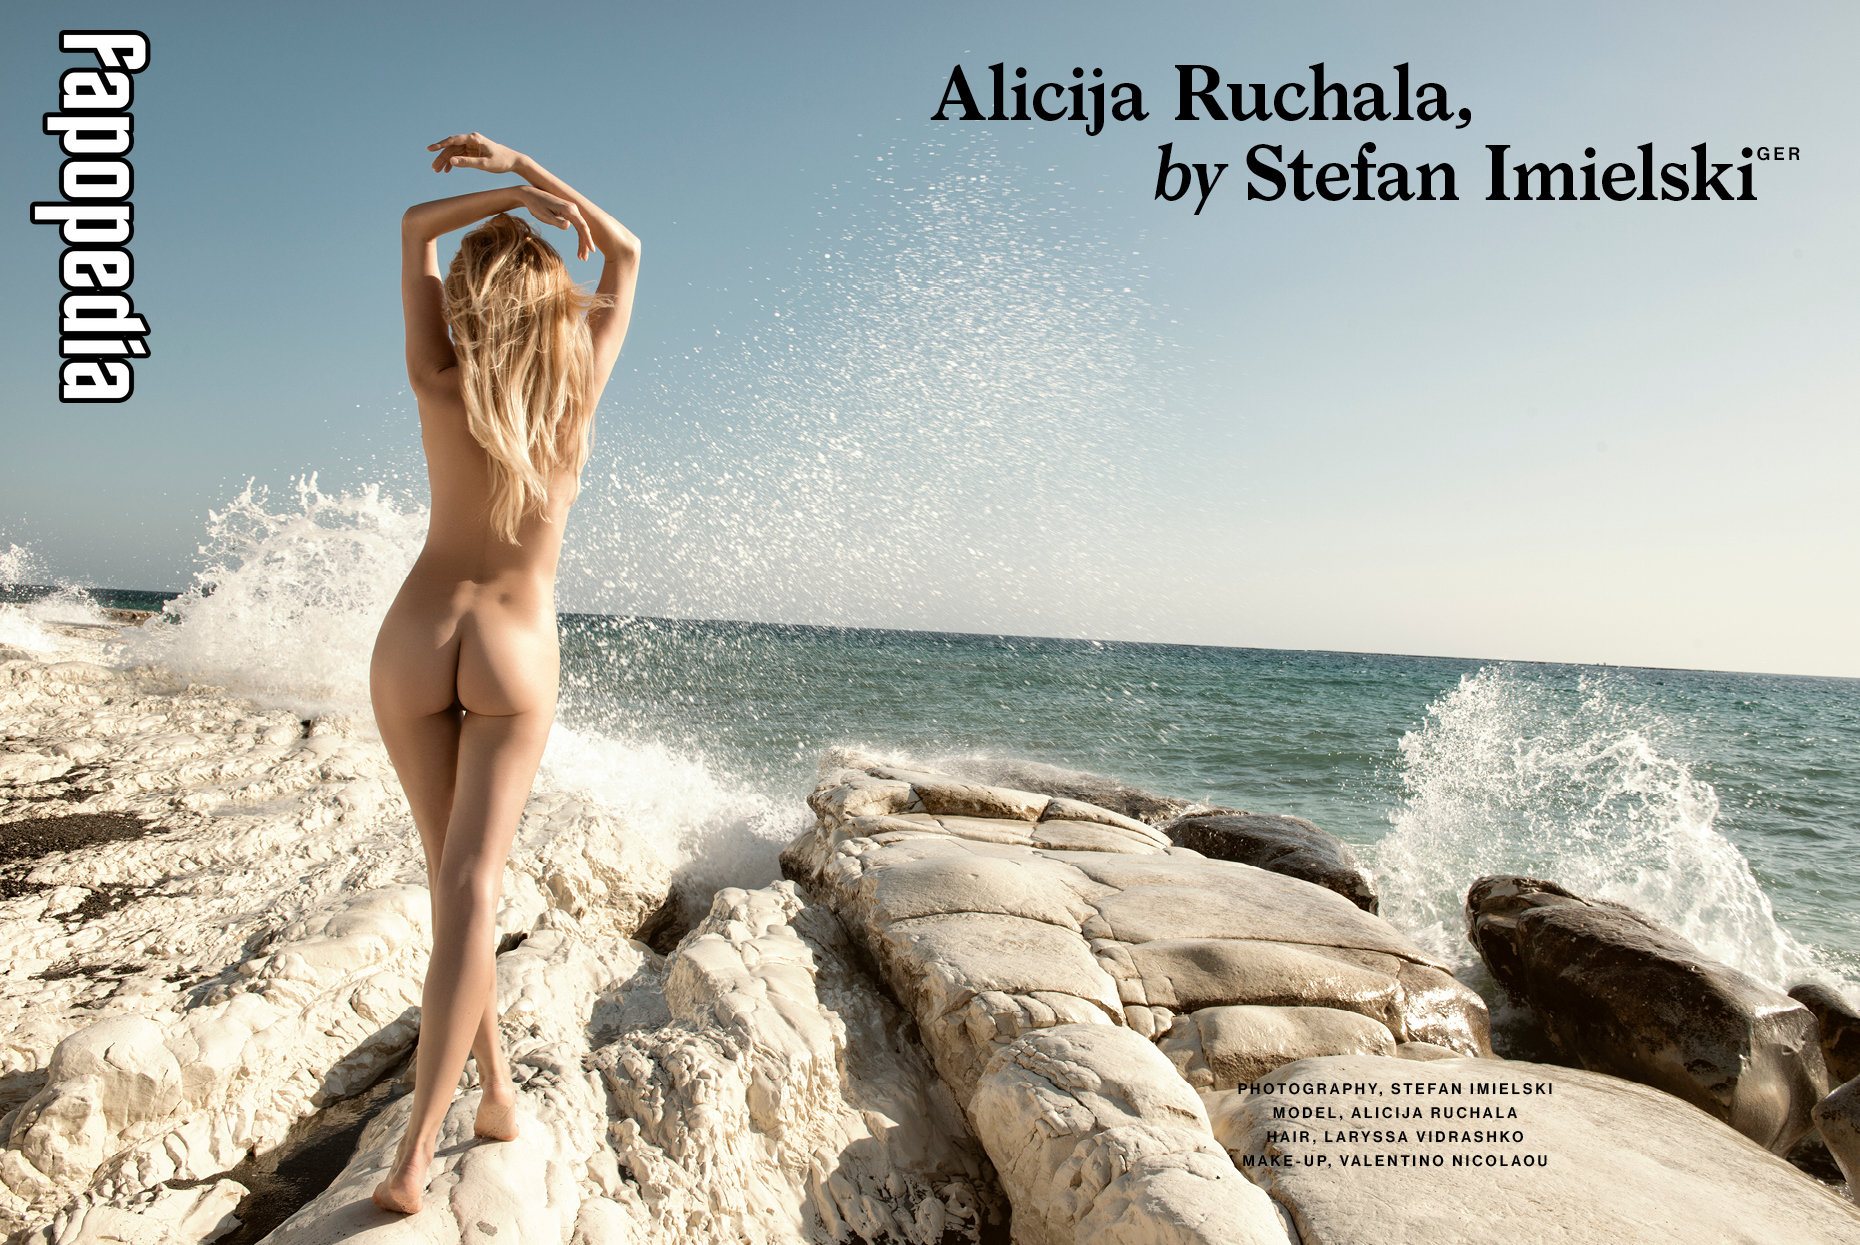 Alicja Ruchala Nude Leaks